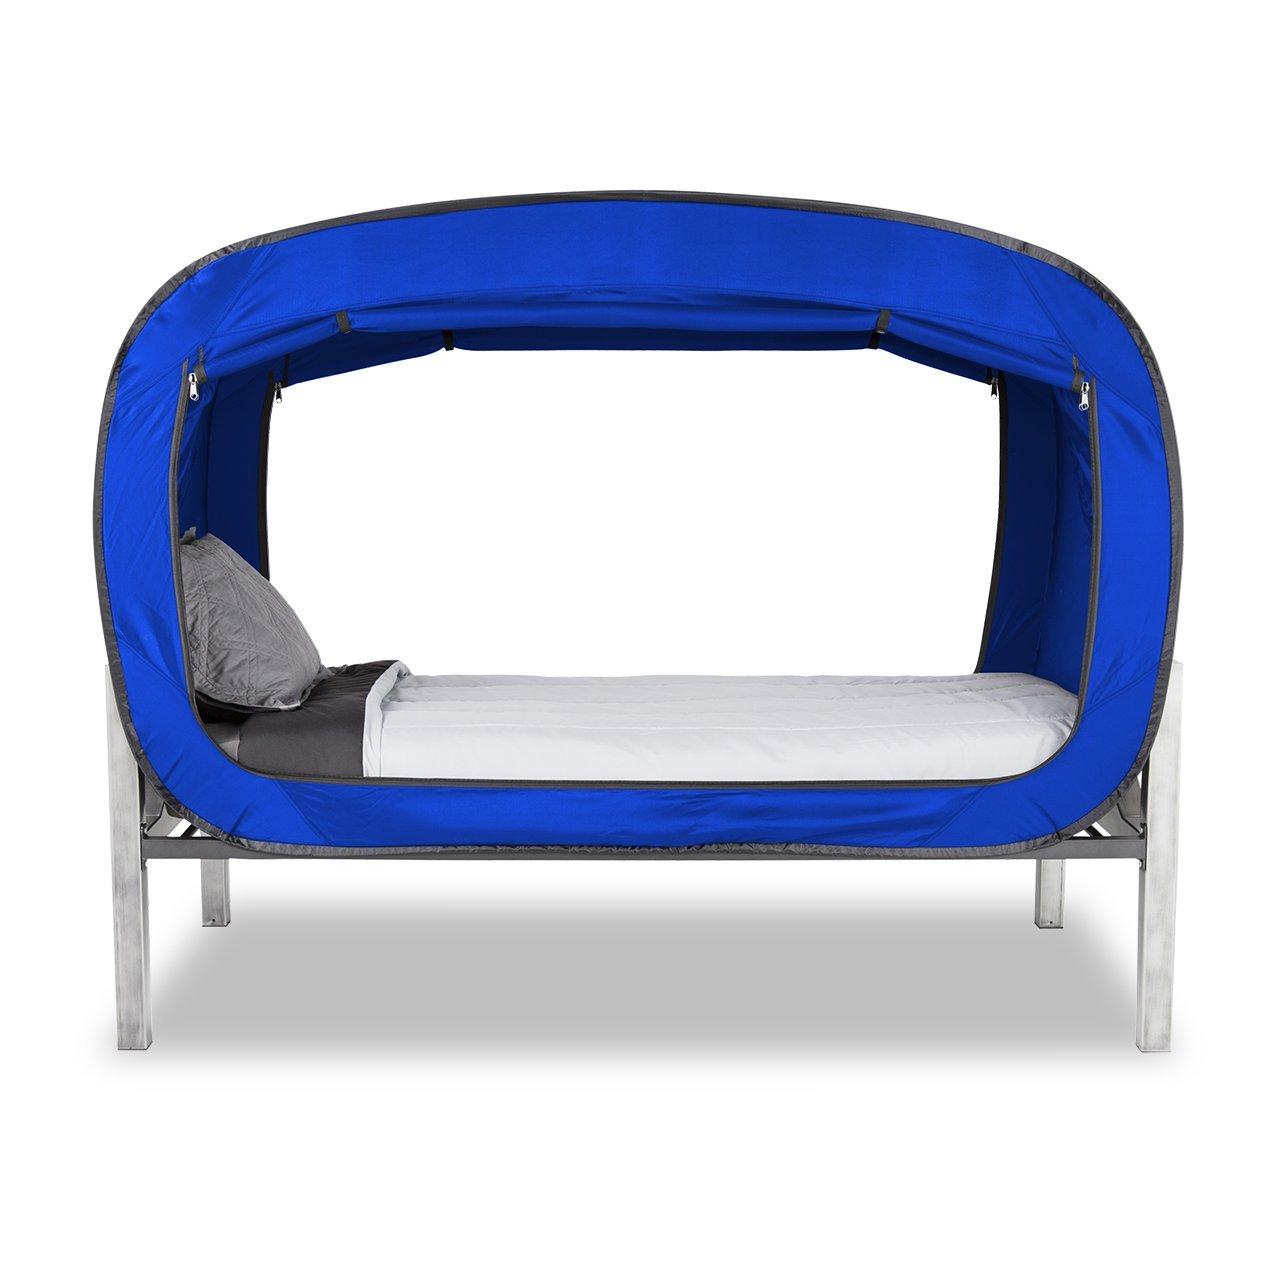 sc 1 st  Amazon.com & Amazon.com: Privacy Pop Bed Tent (Twin) - BLUE: Toys u0026 Games